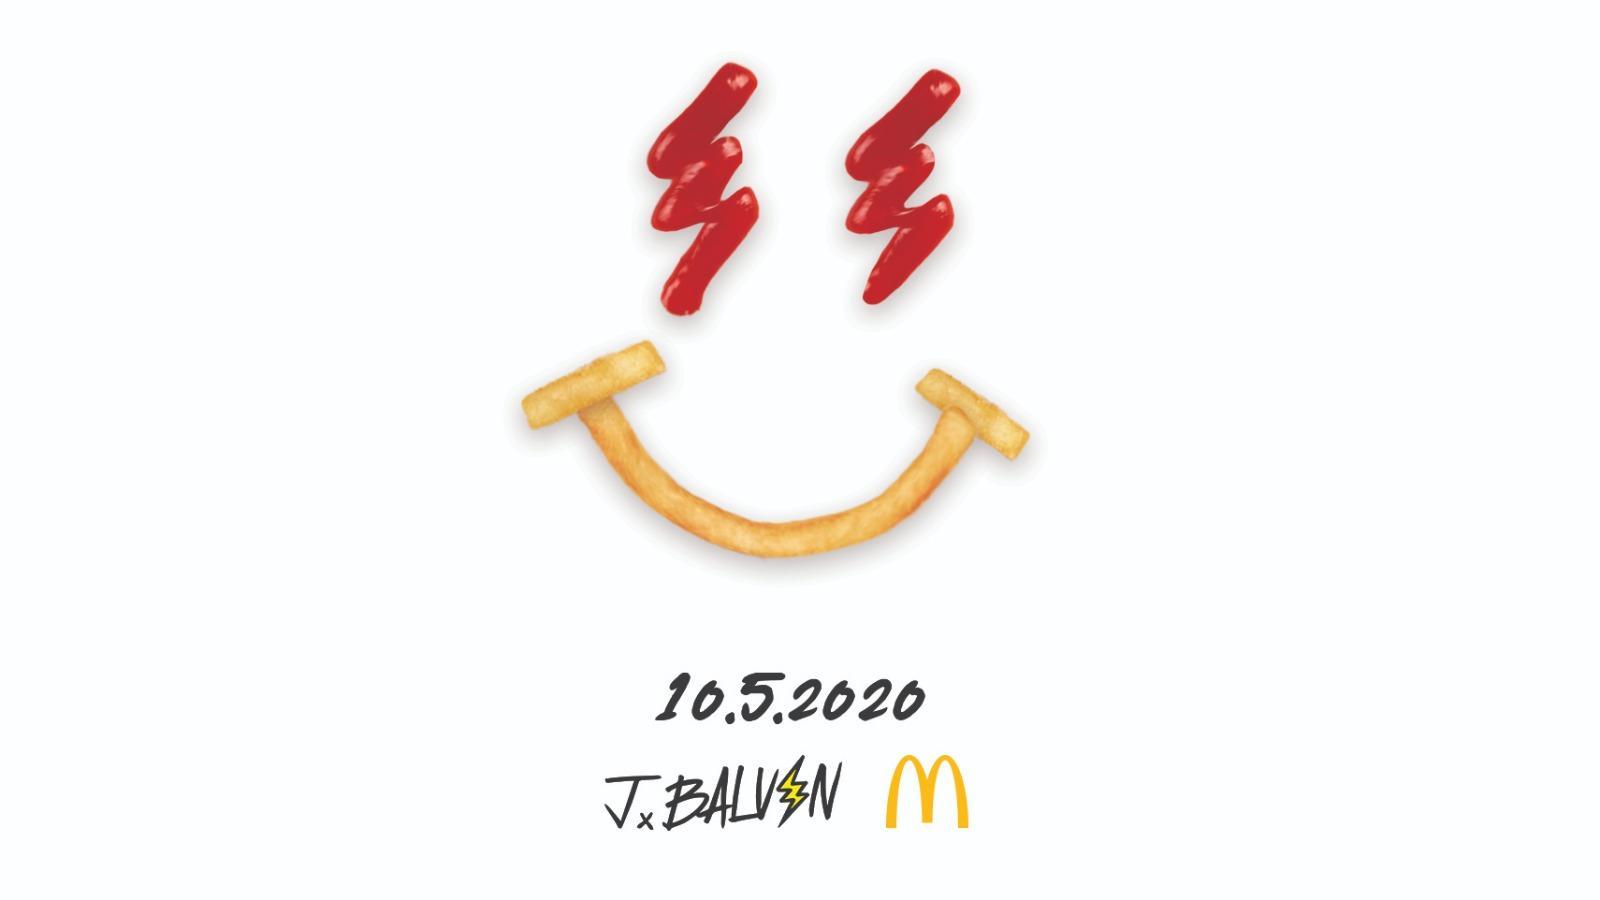 J Balvin and McDonalds